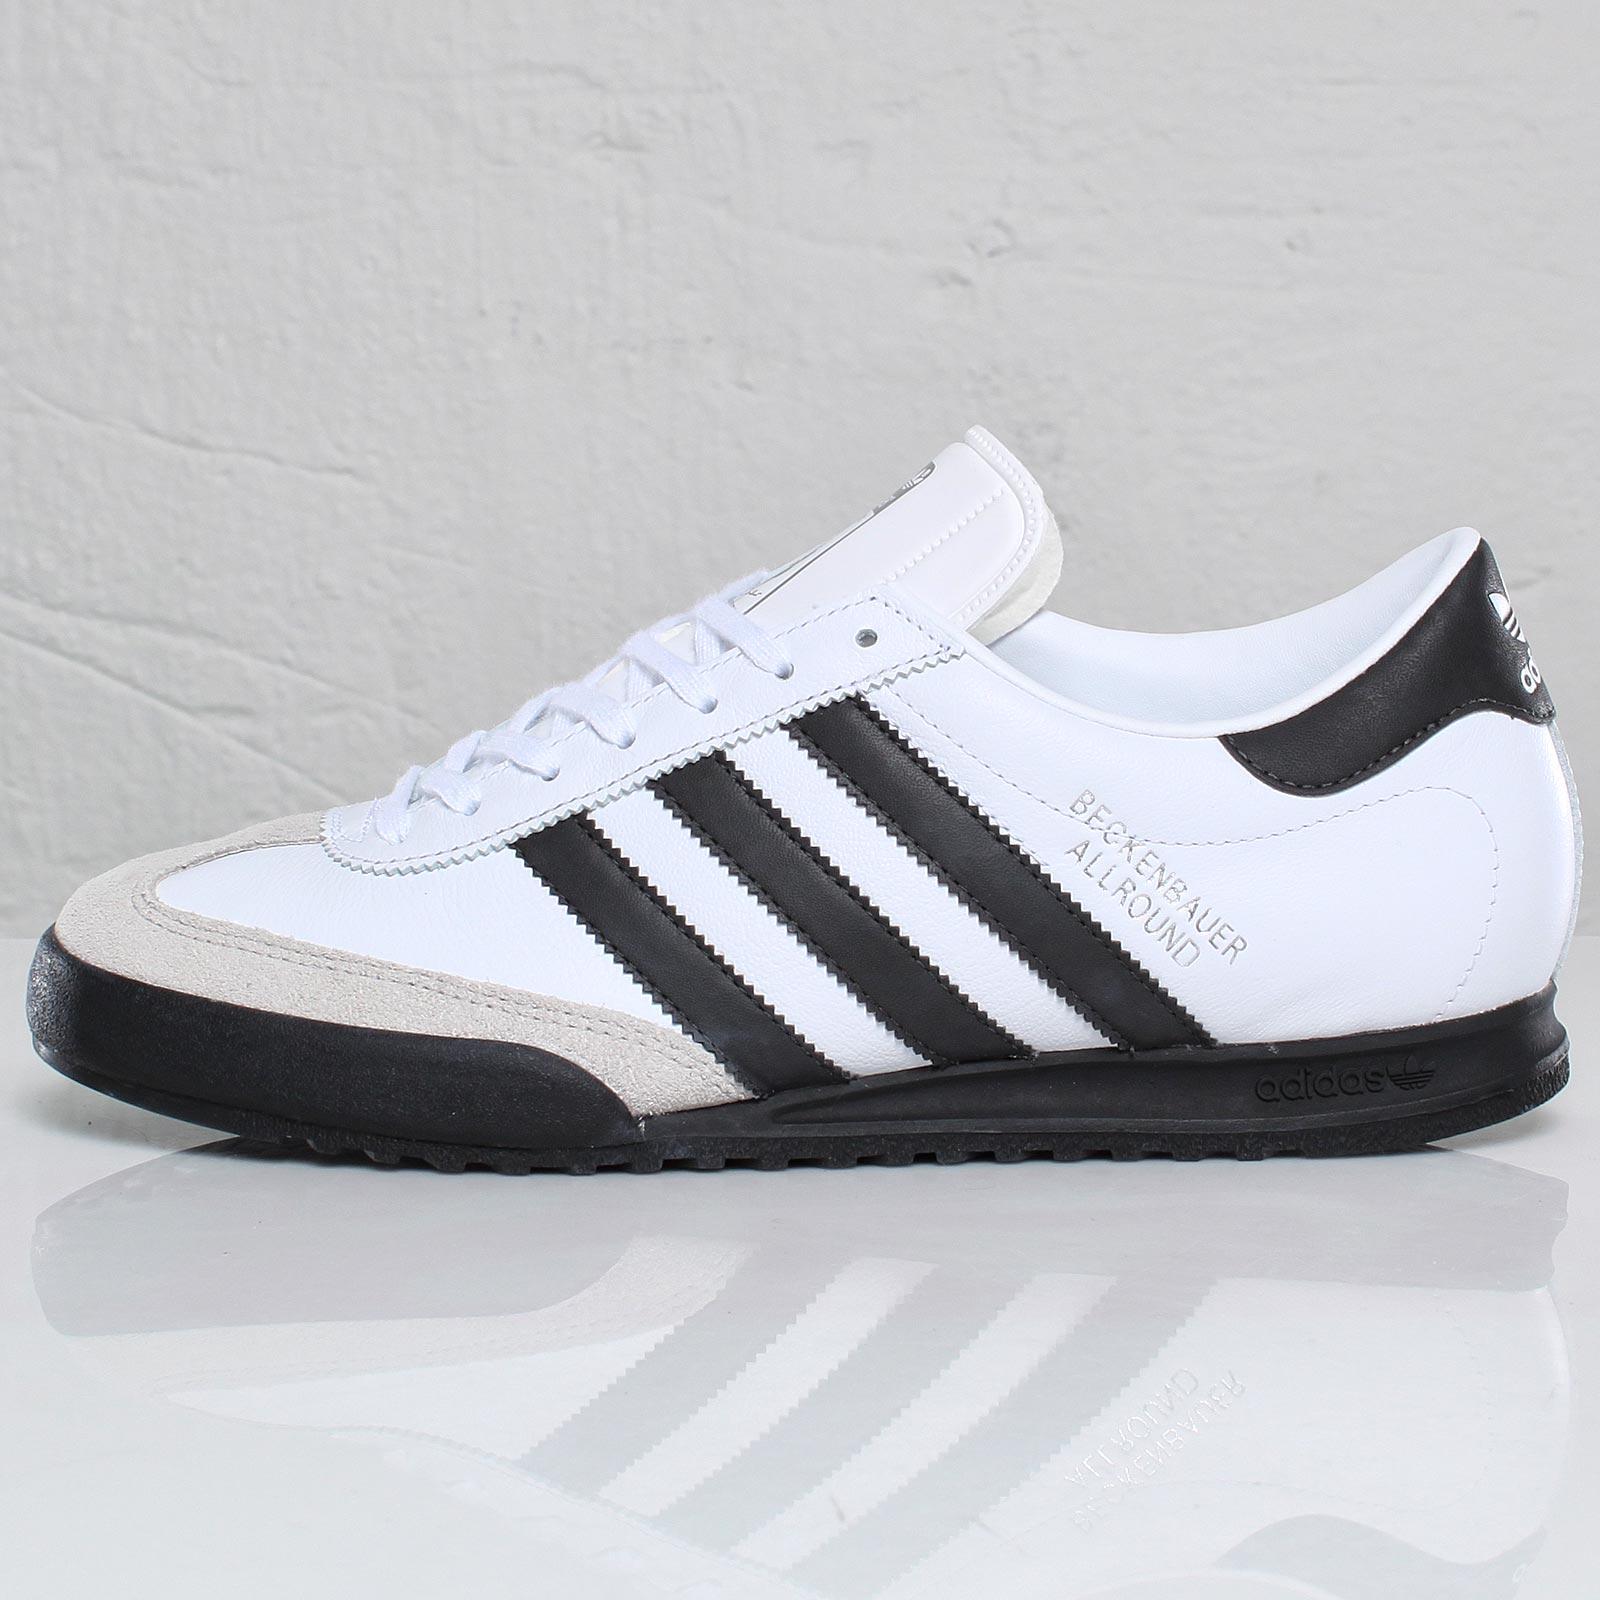 ef35e83116f0 Sneaker 101919 Allround Adidas Beckenbauer Sneakersnstuff S0T0RZ